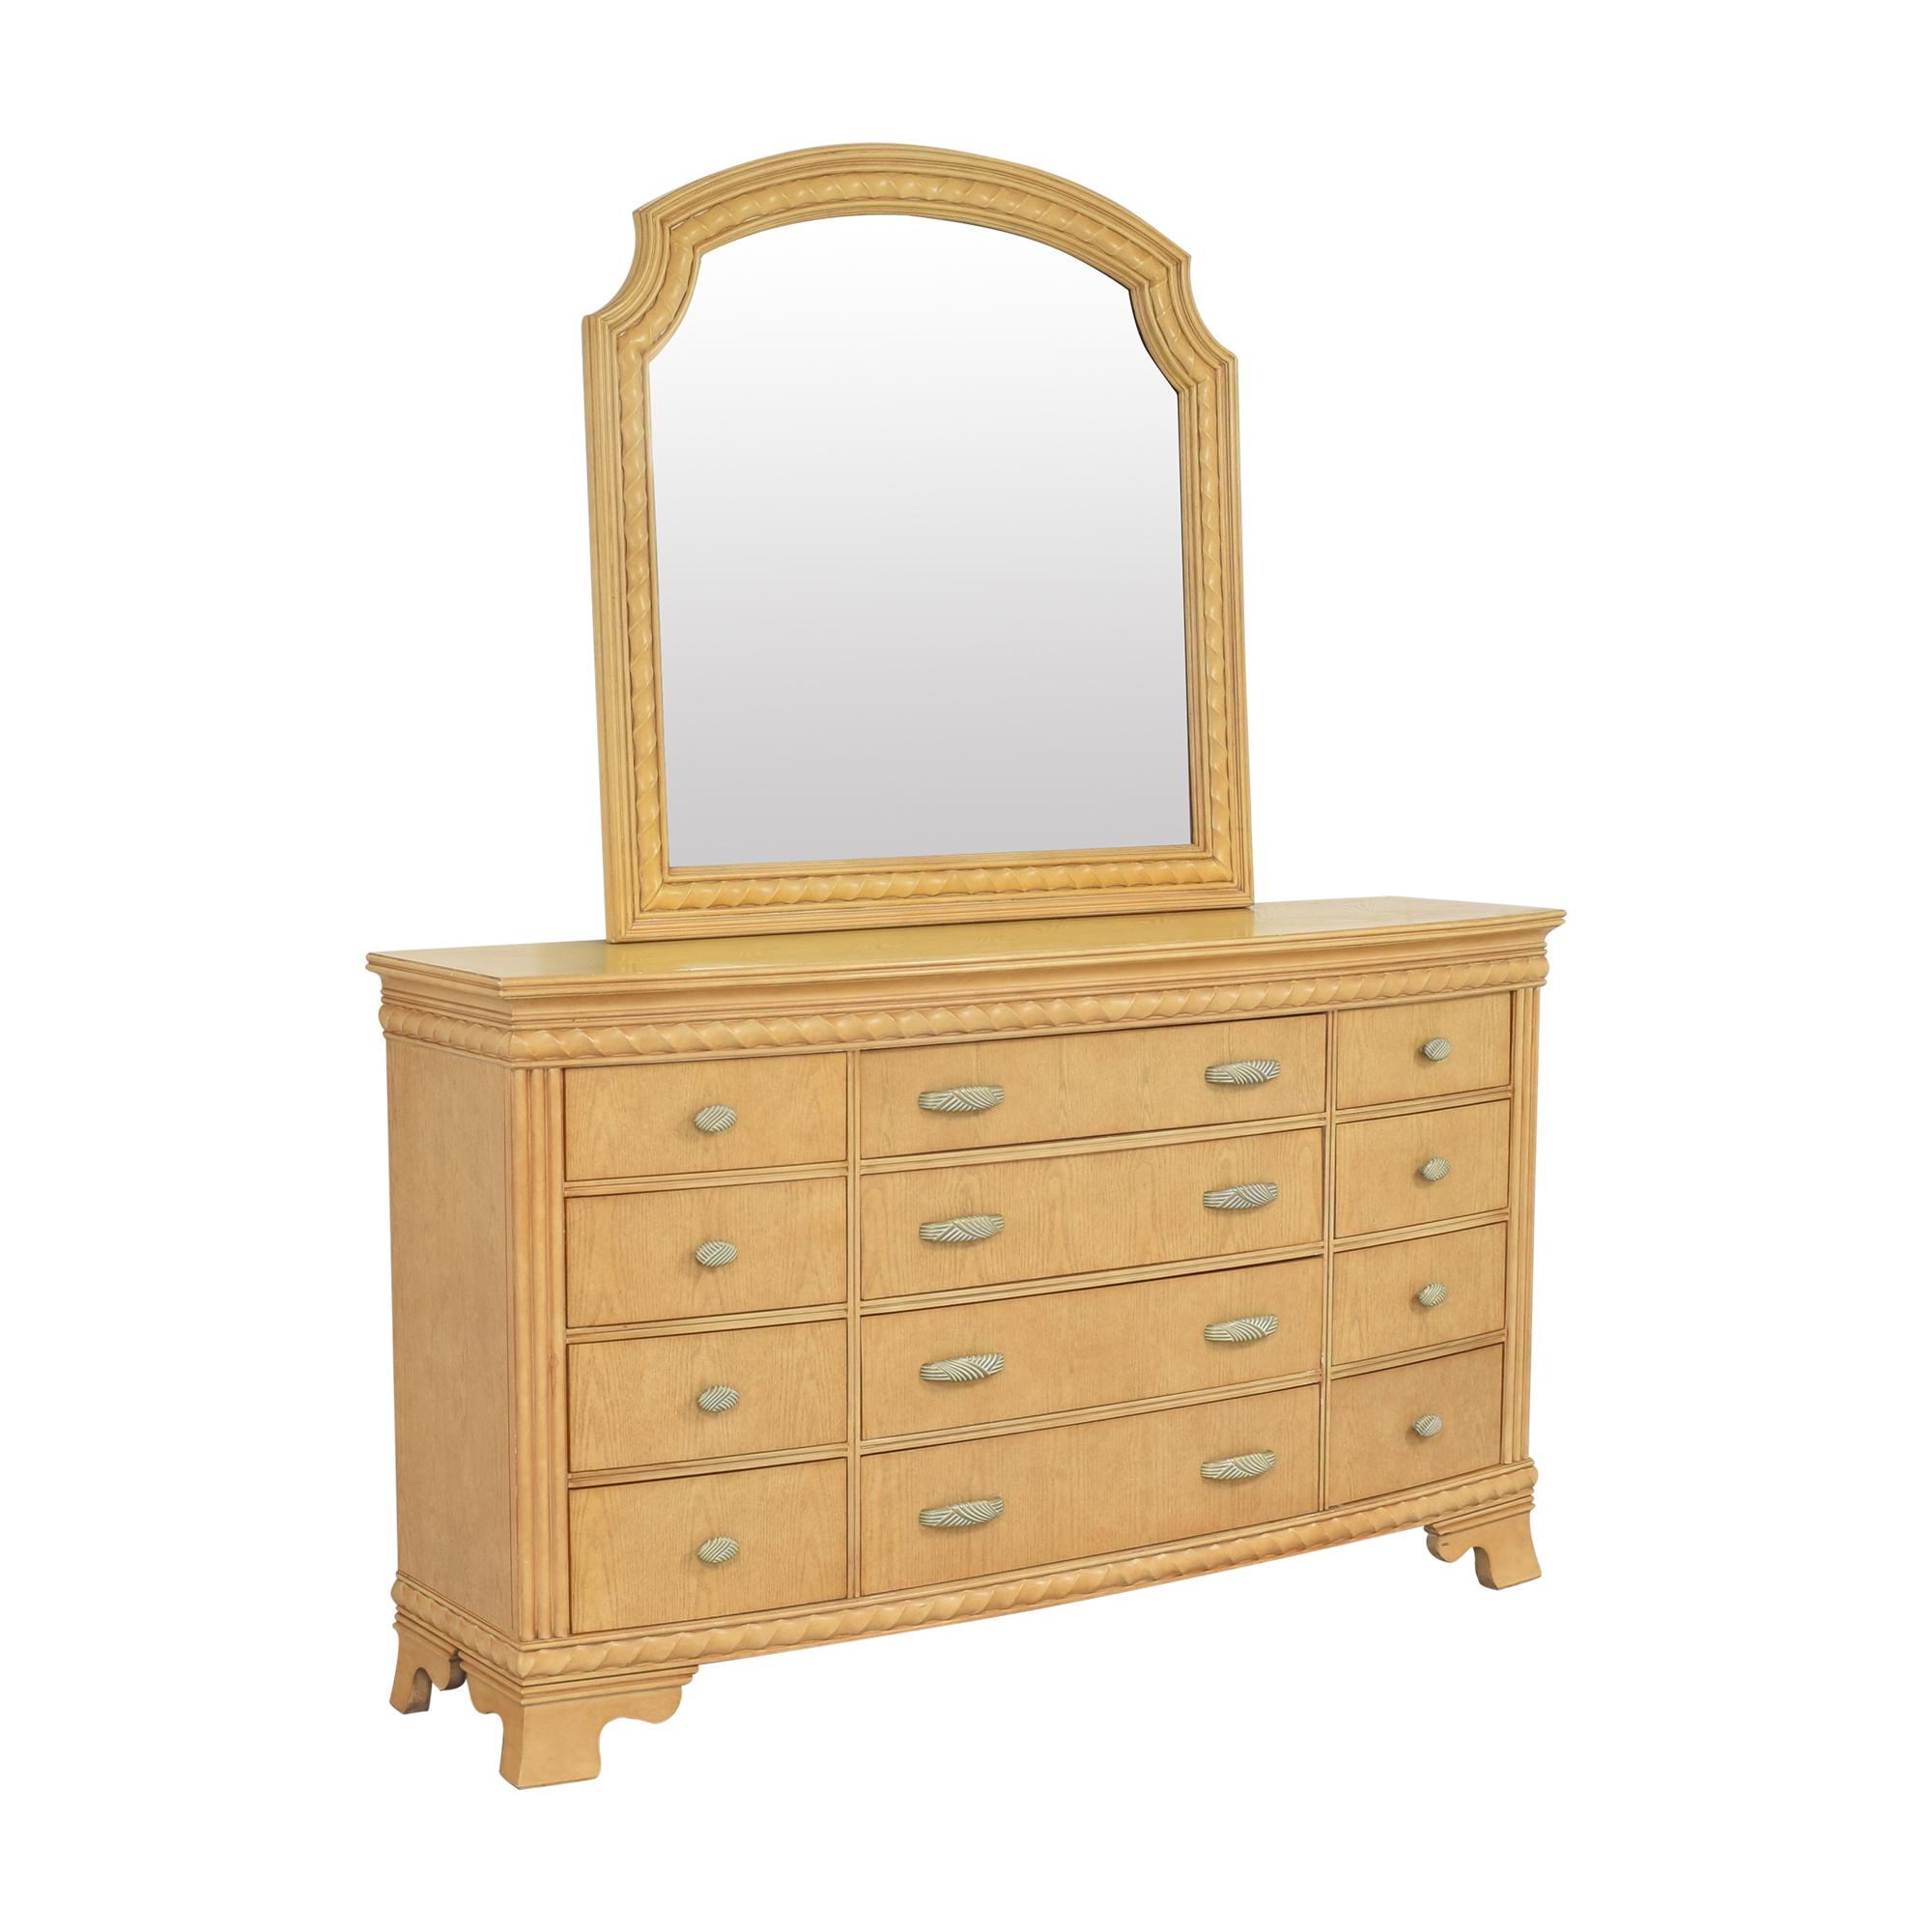 Raymour & Flanigan Raymour & Flanigan Triple Dresser with Mirror dimensions